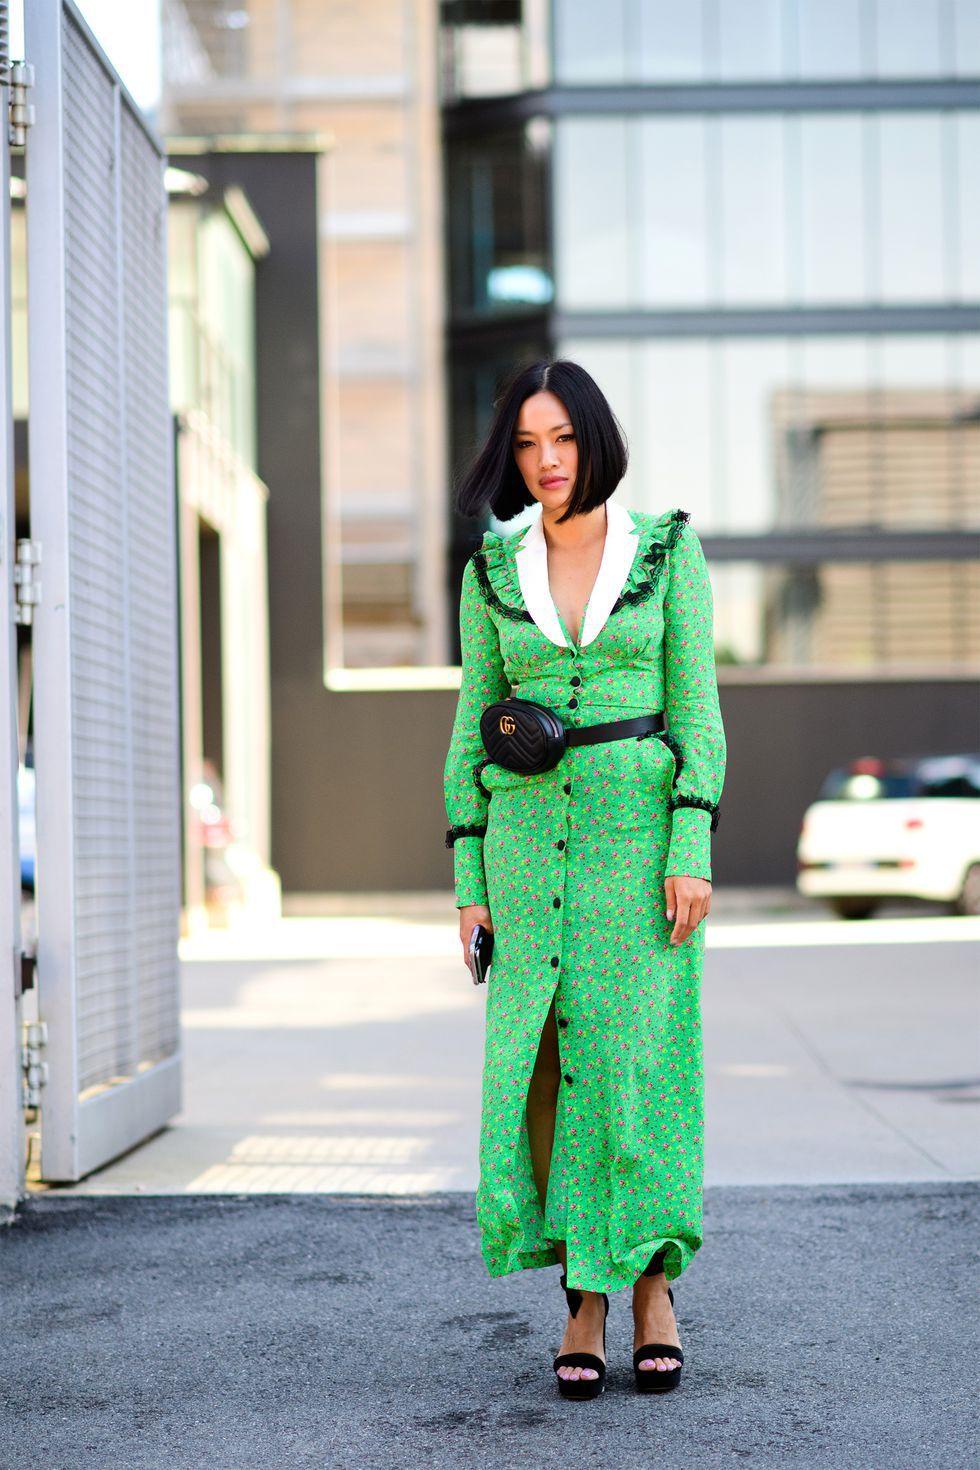 tiffany hsu fall dresses stylebook edit seven 2018 toronto tiff